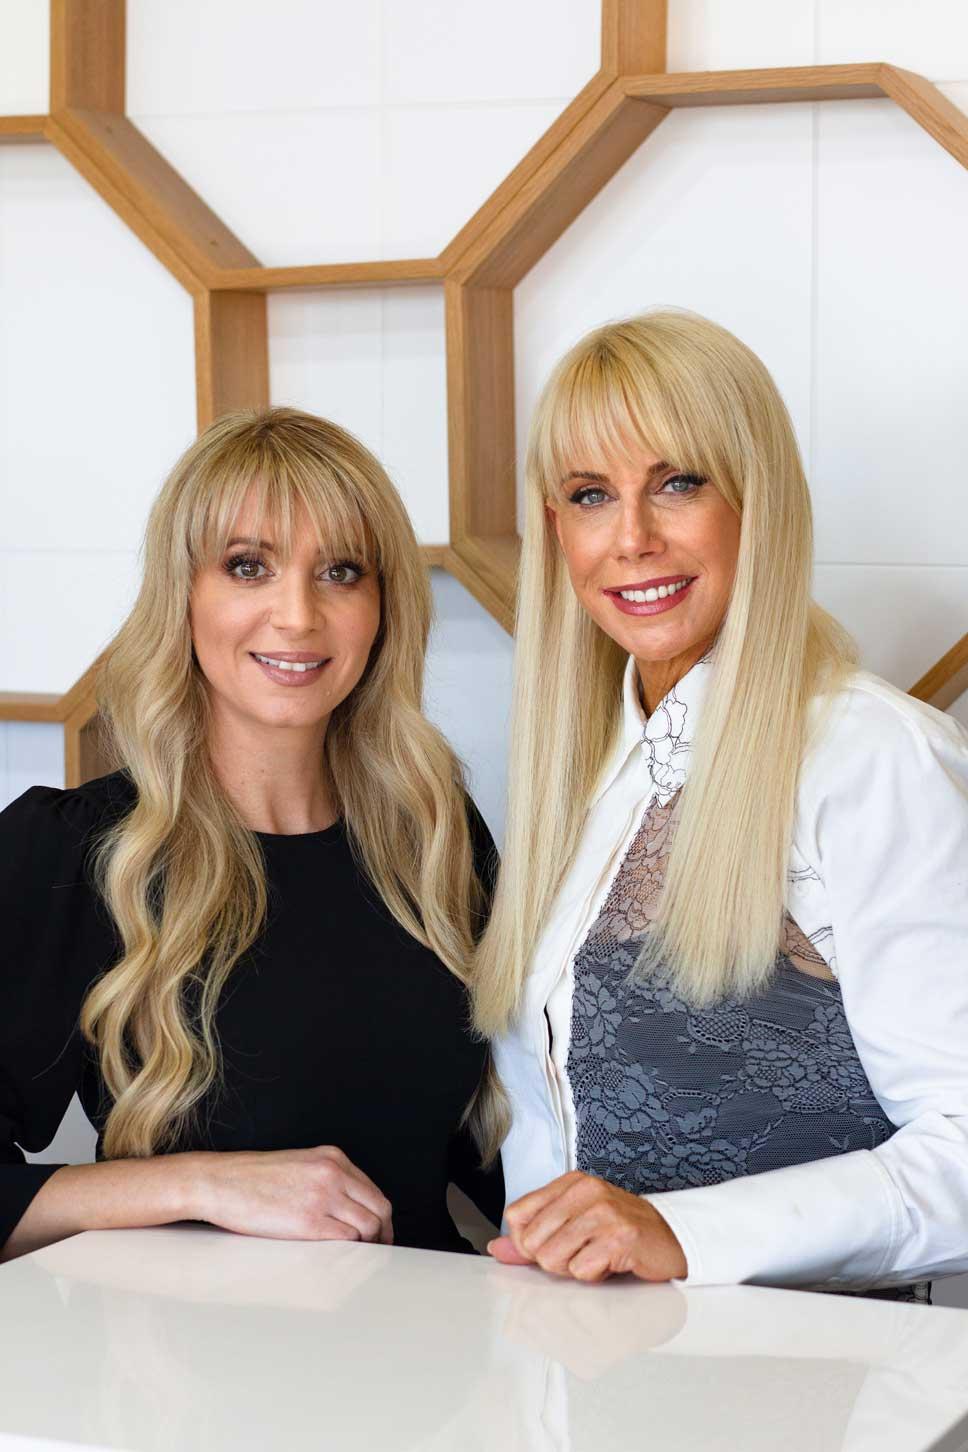 Naomi-Panizza-Hair-Extenions-Perth-Naomi-and-Vanessa